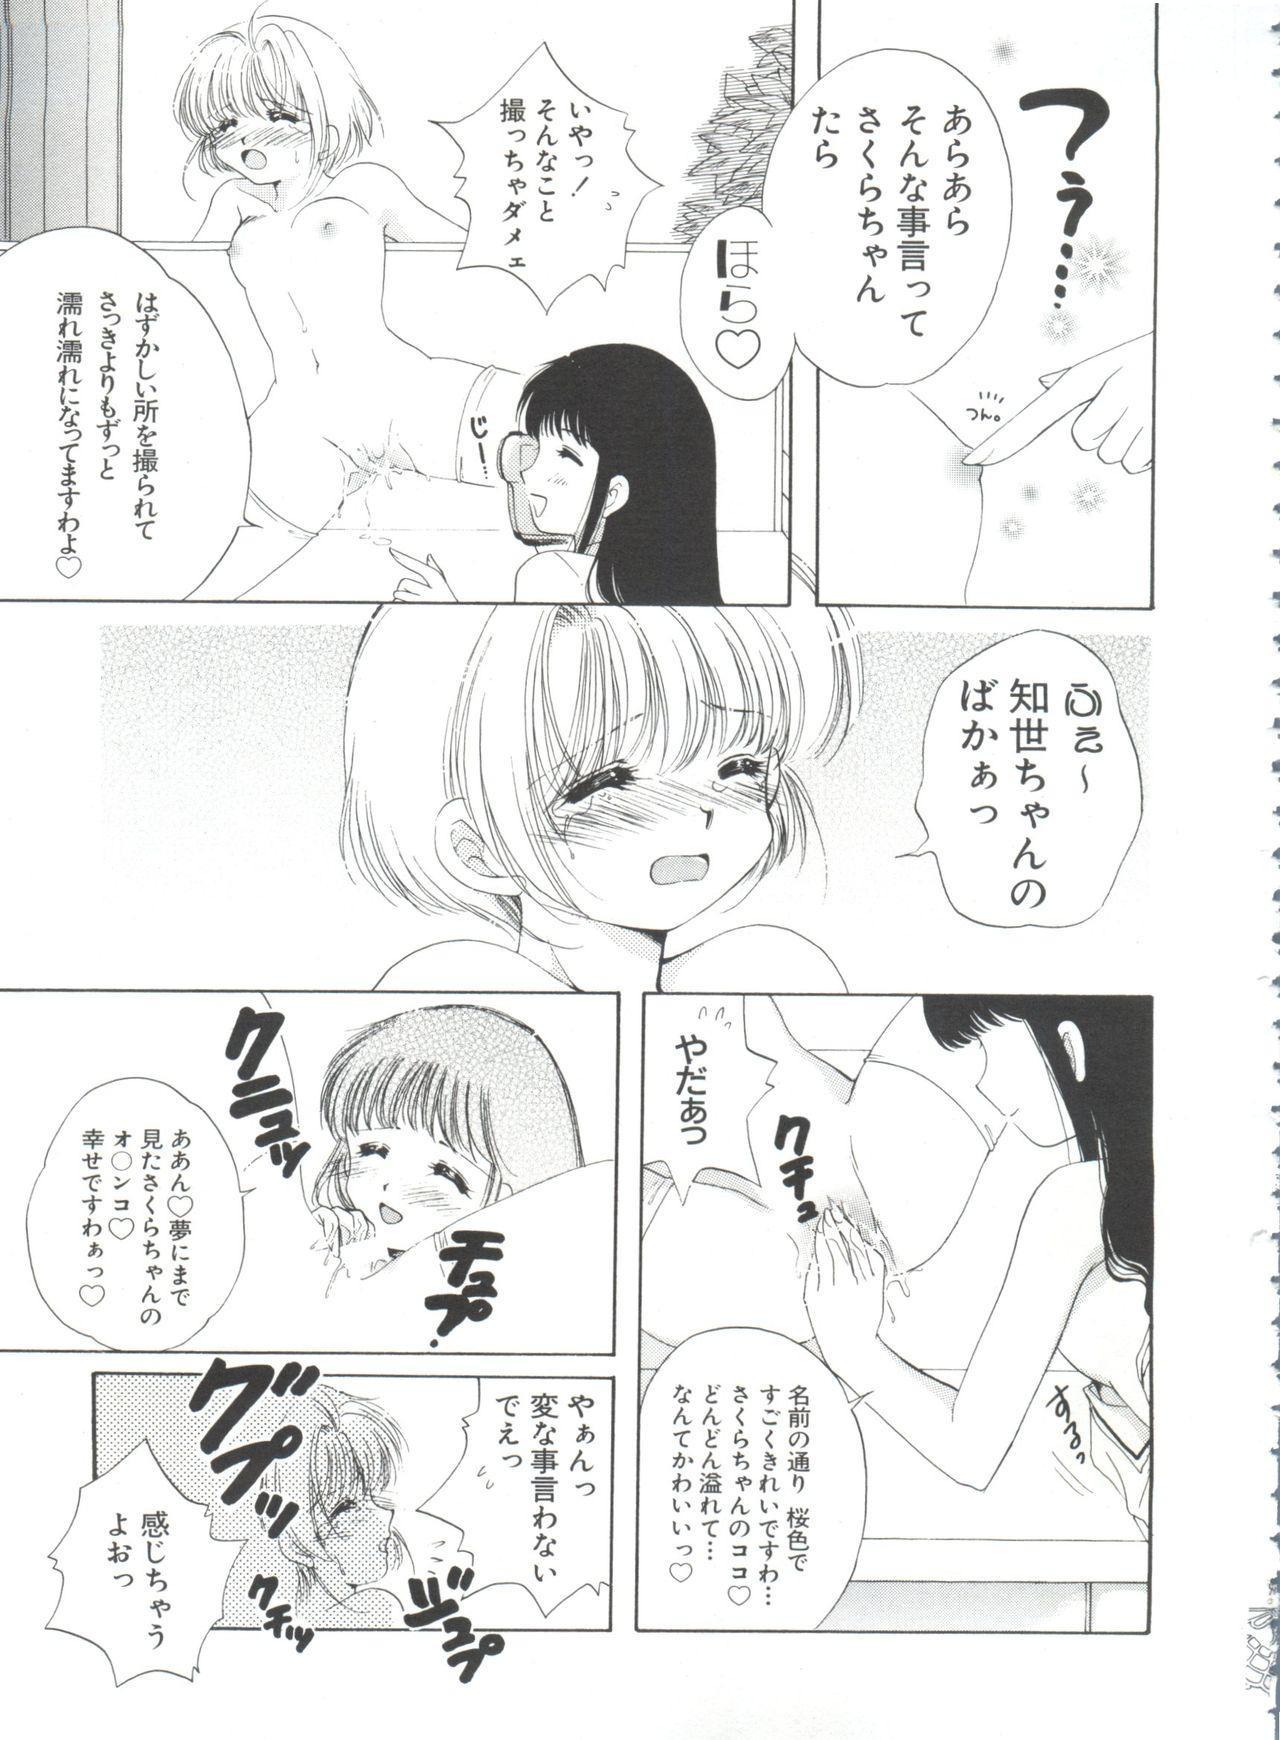 Ero-chan to Issho 3 124